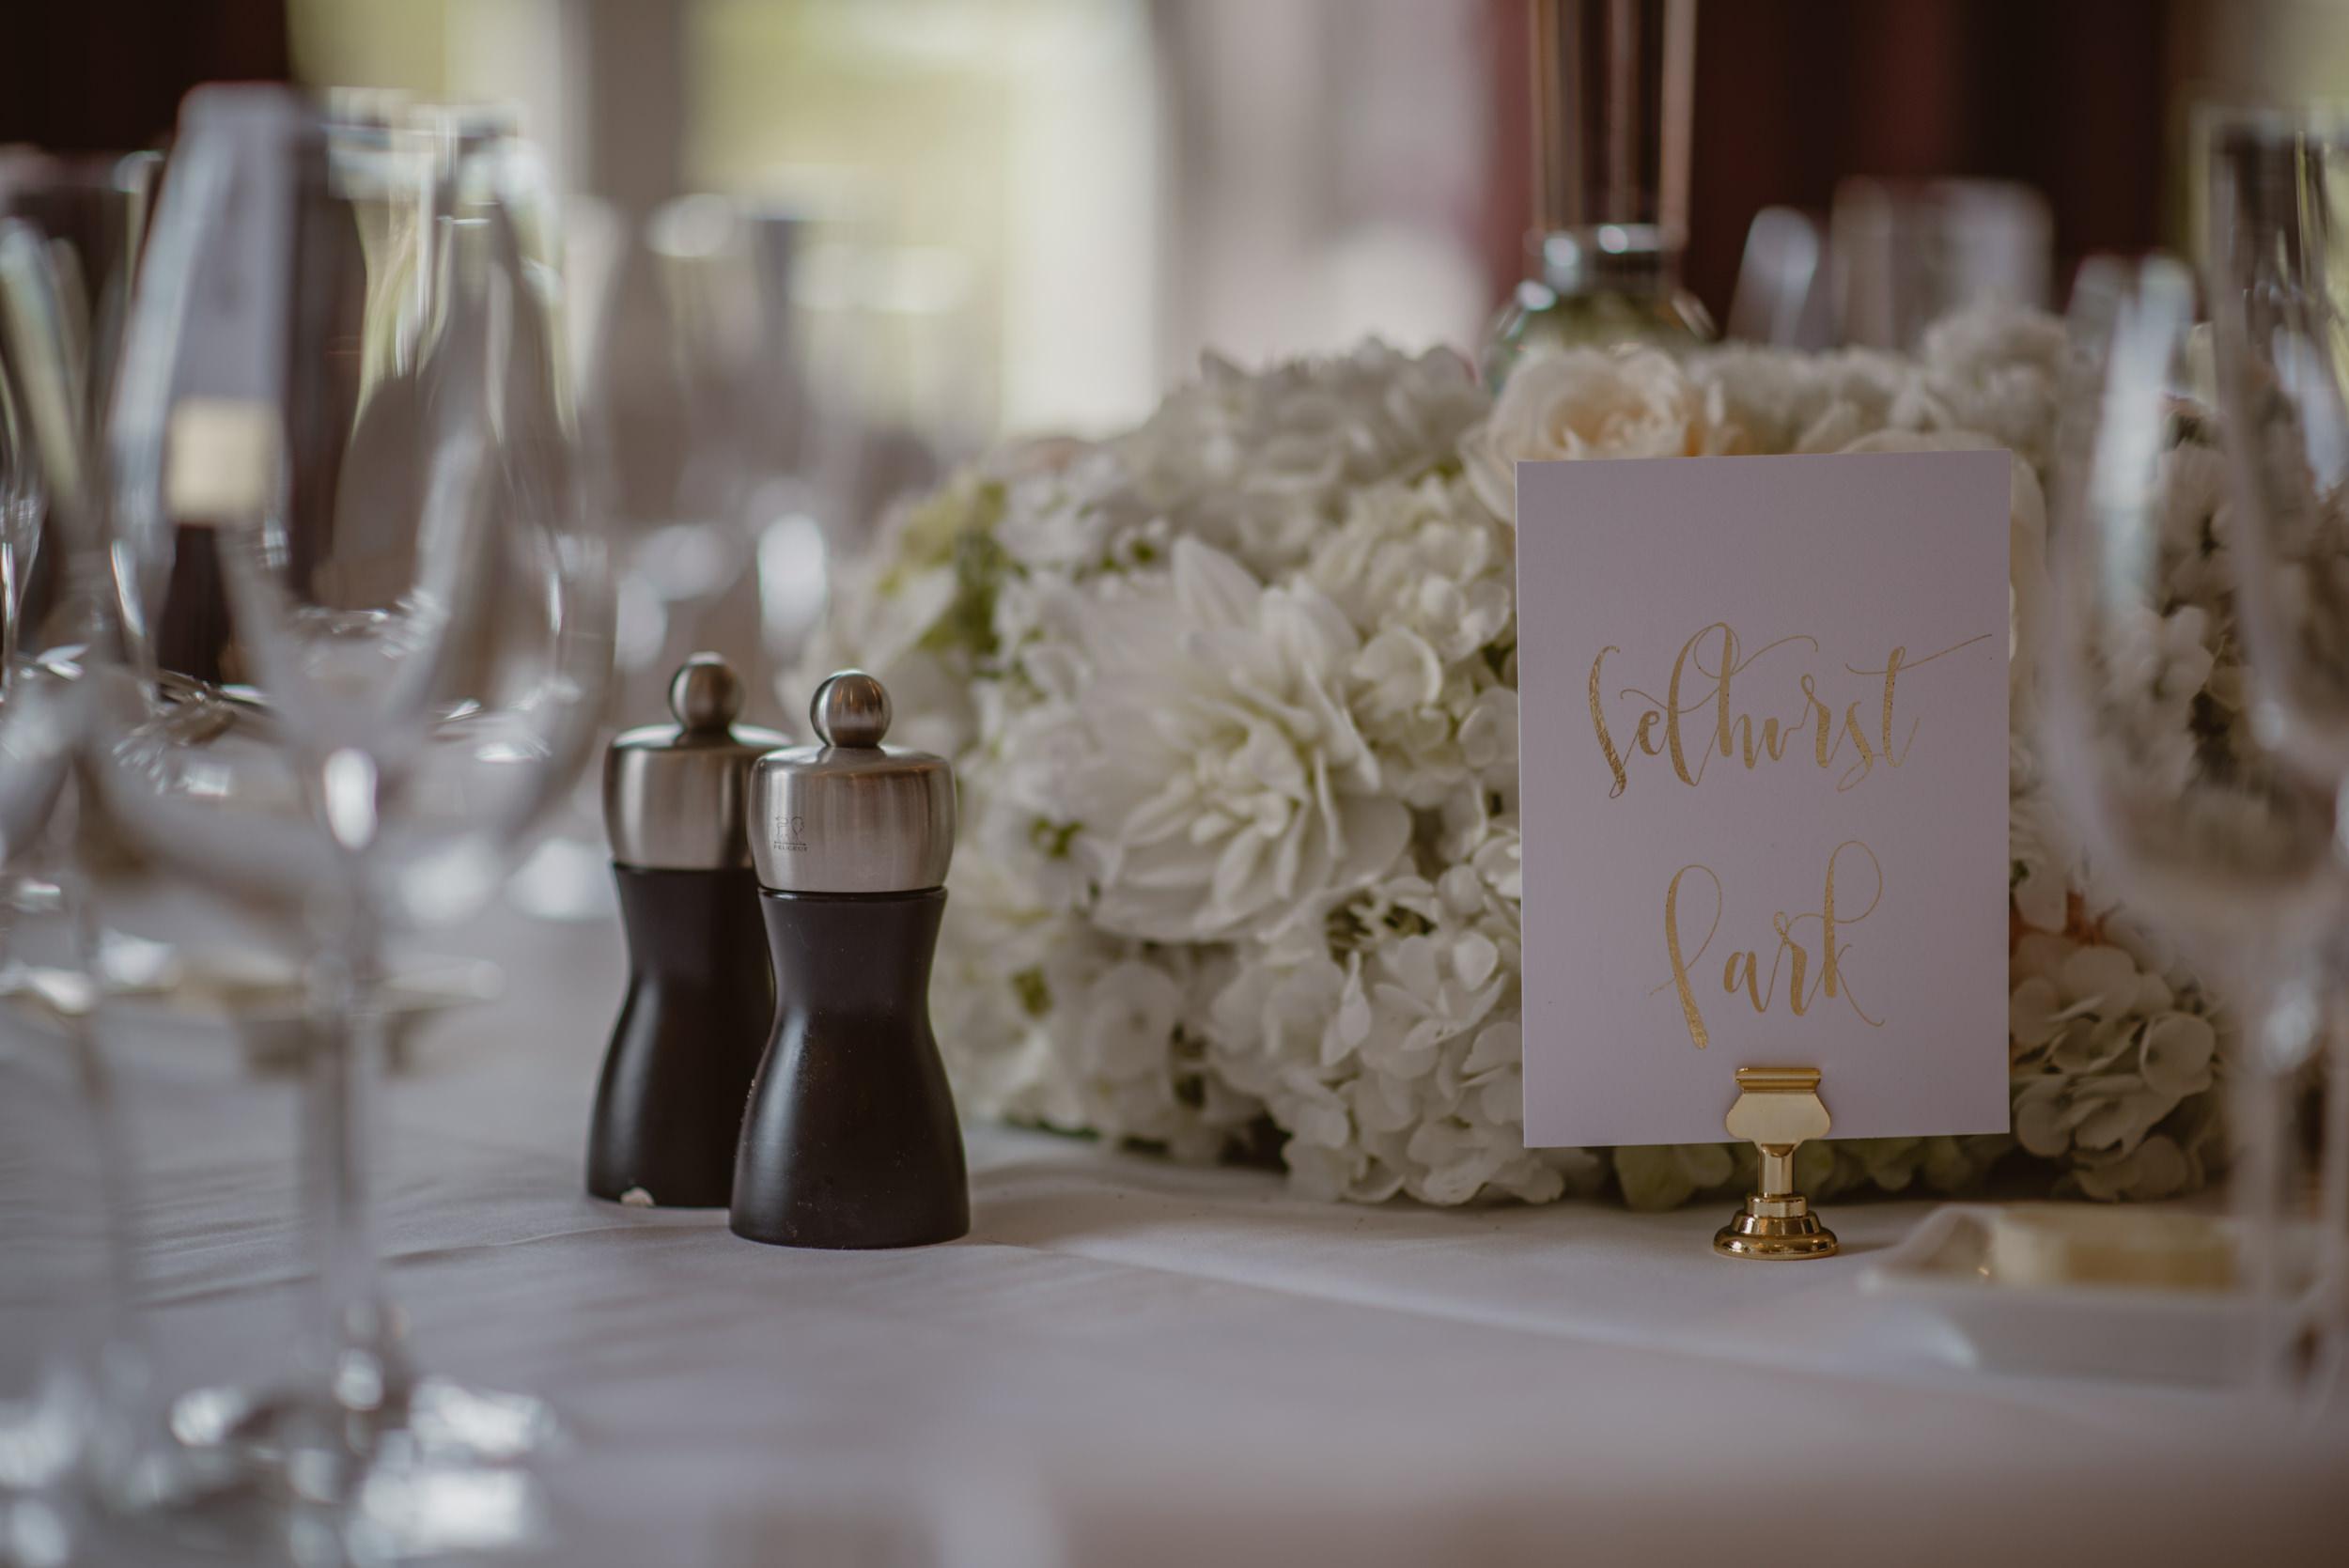 Trisha-and-Roger-wedding-The-Priory-Church-and-Chewton-Glen-Hotel-Christchurch-Manu-Mendoza-Wedding-Photography-278.jpg